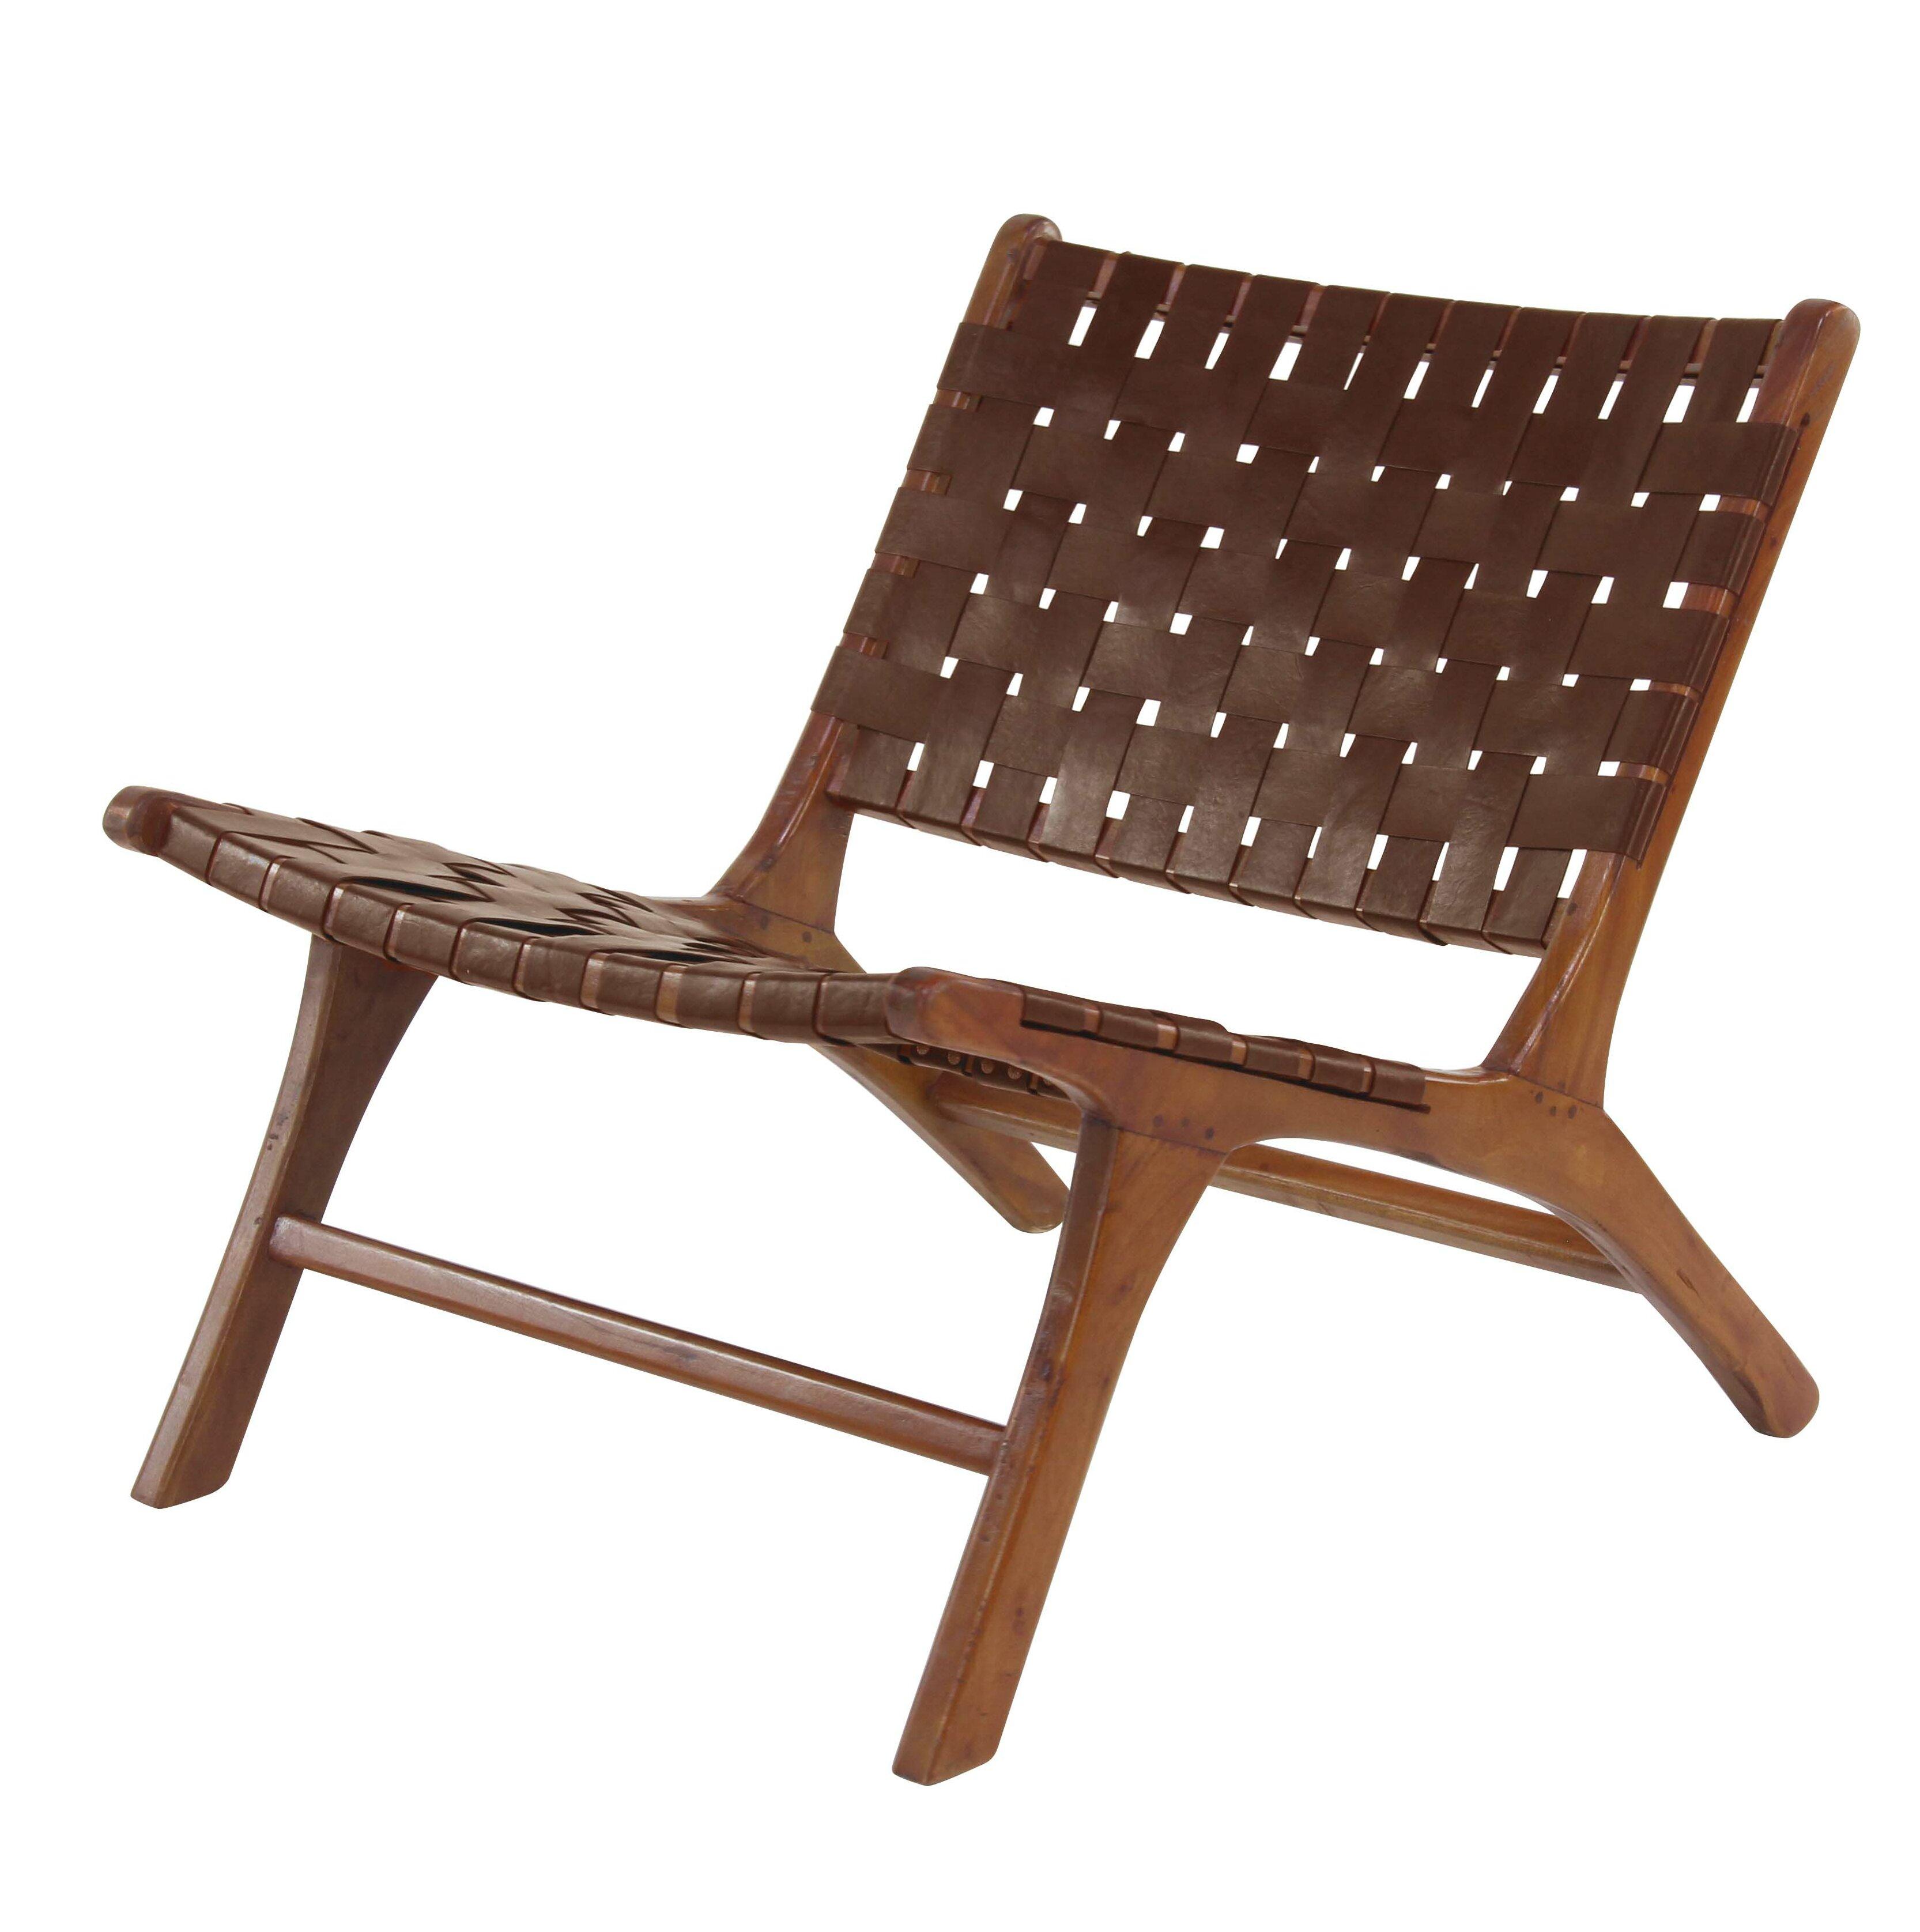 Elegant George Oliver Veatch Rustic Mahogany Lounge Chair | Wayfair